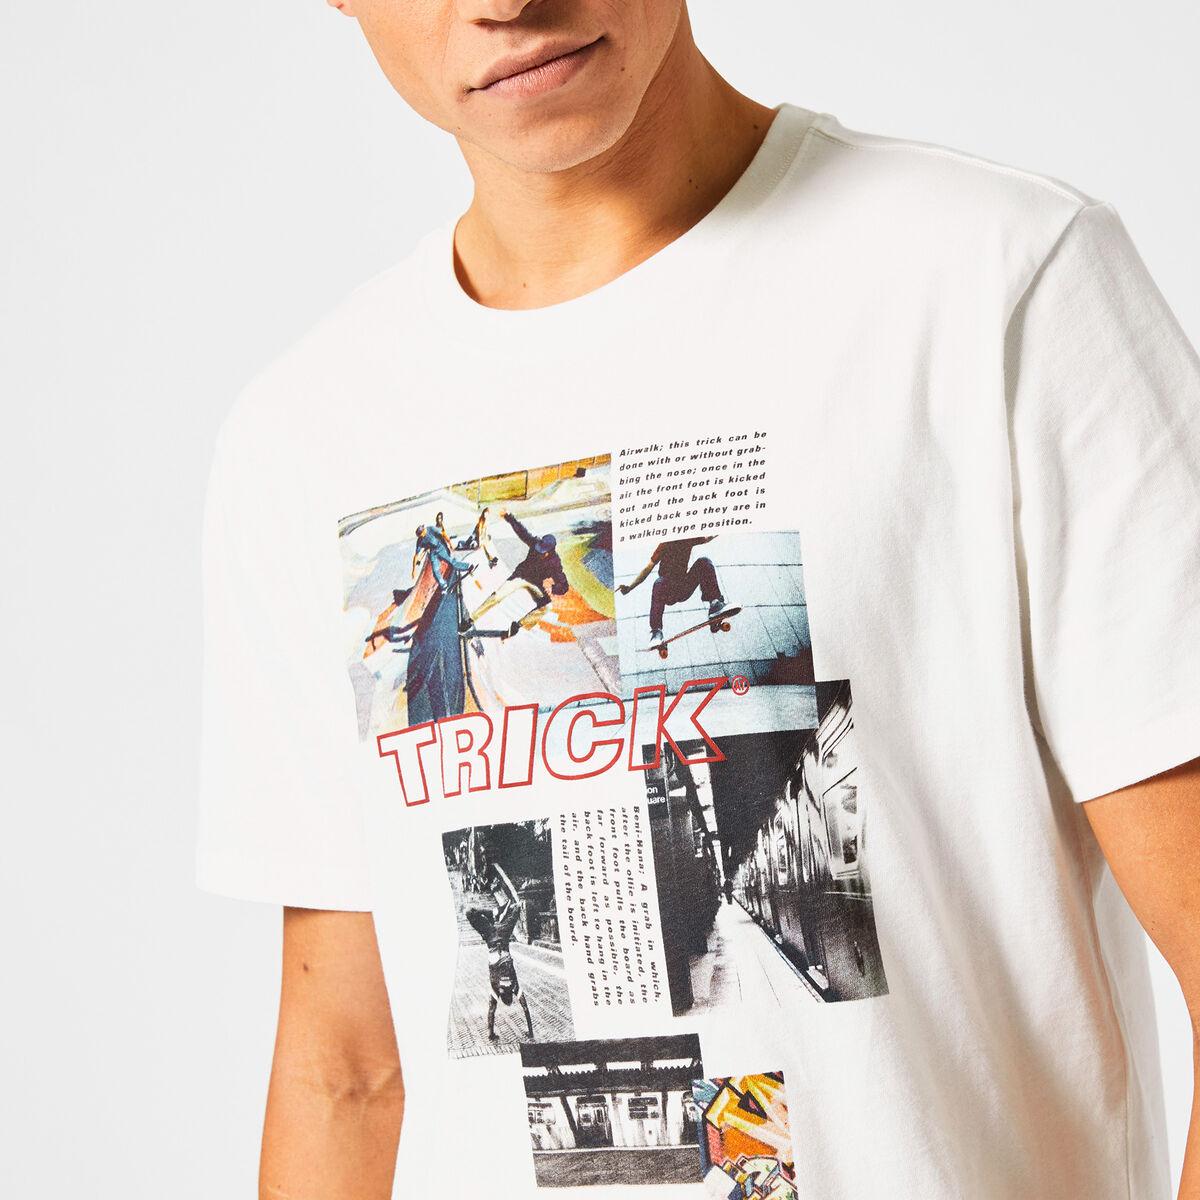 T-shirt Emory trick